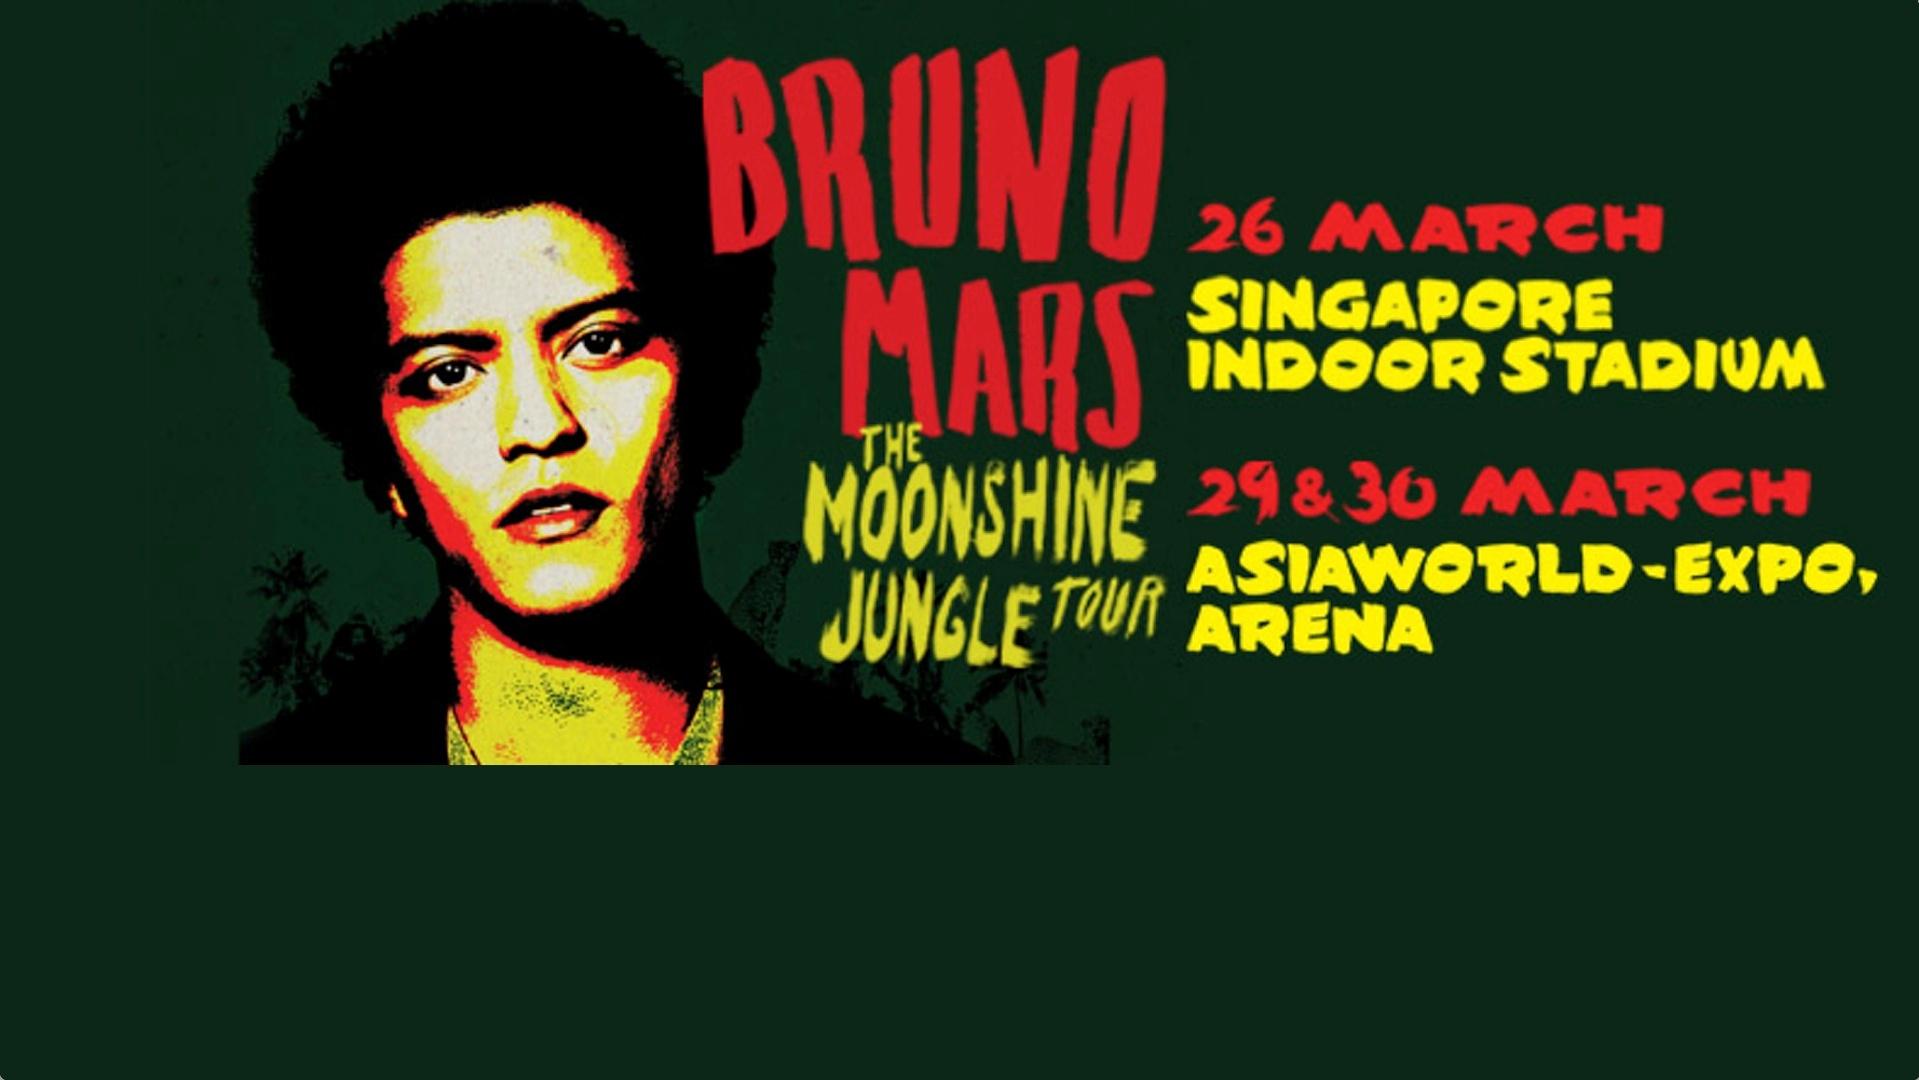 Bruno Mars Live In Singapore